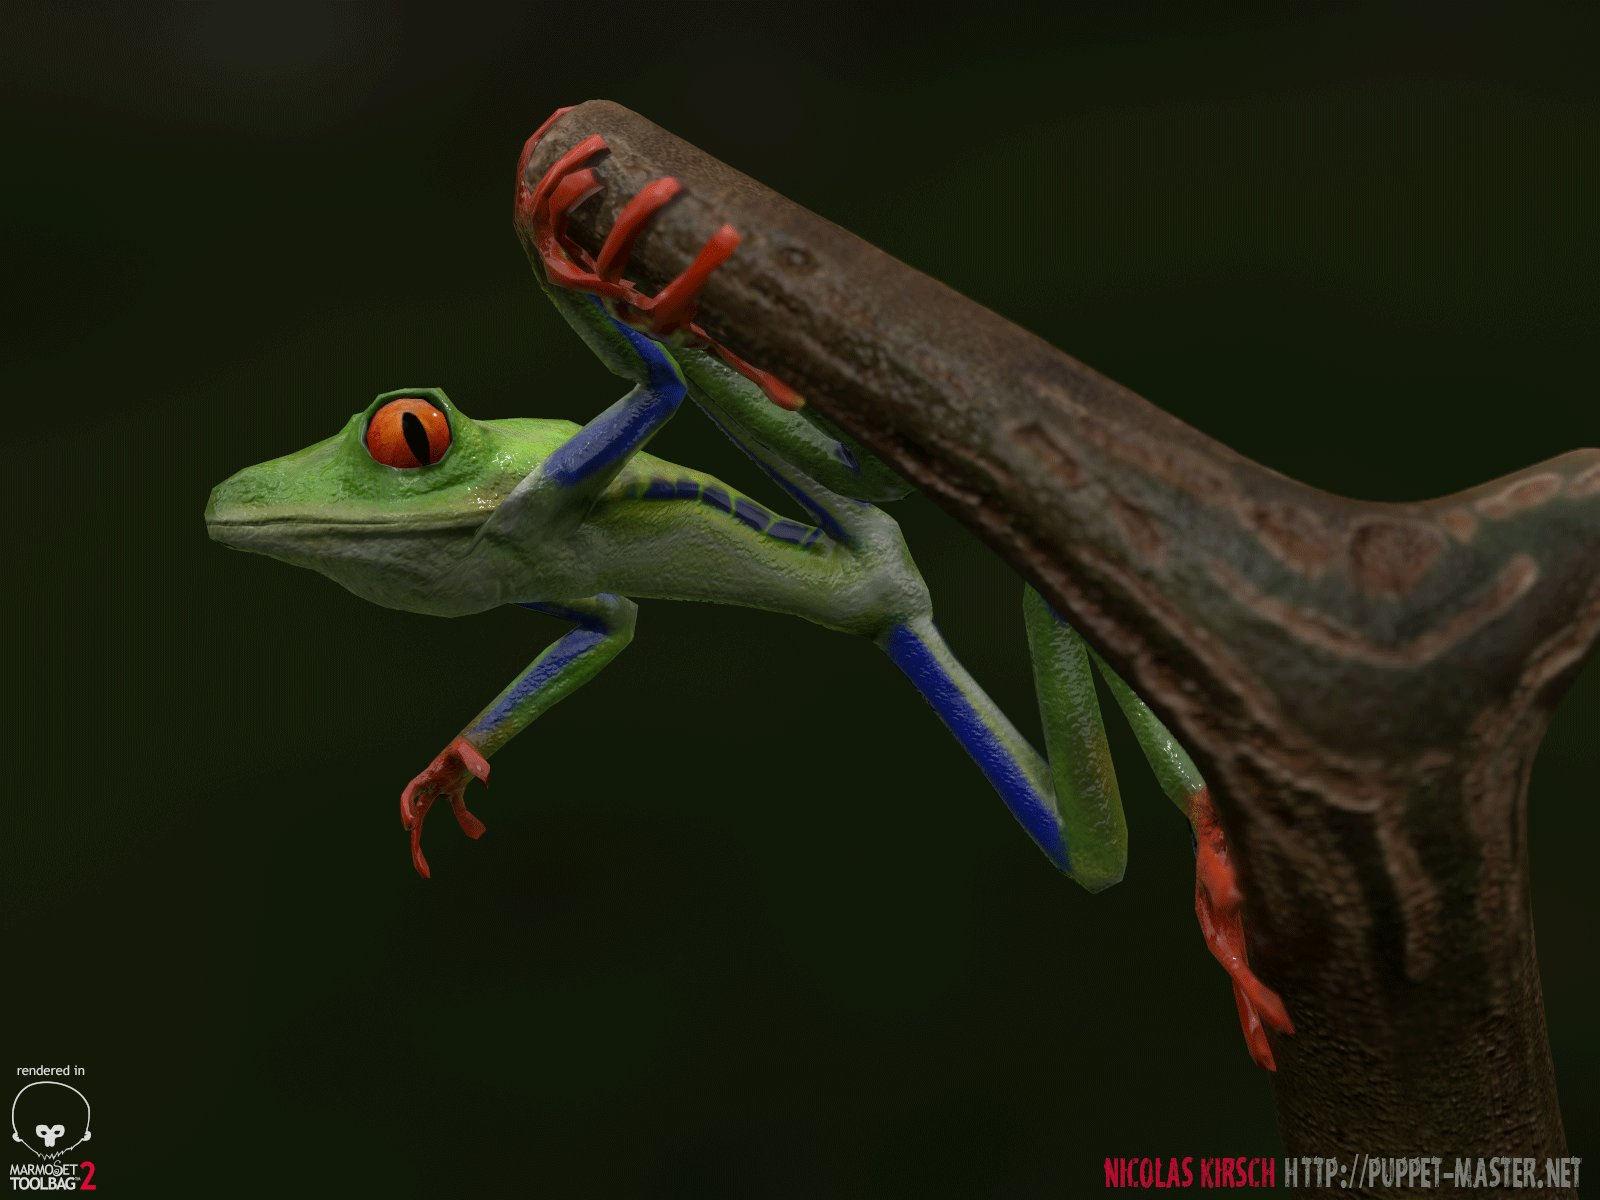 nicolas-kirsch-treefrog-superhero-04.jpg?1442191055